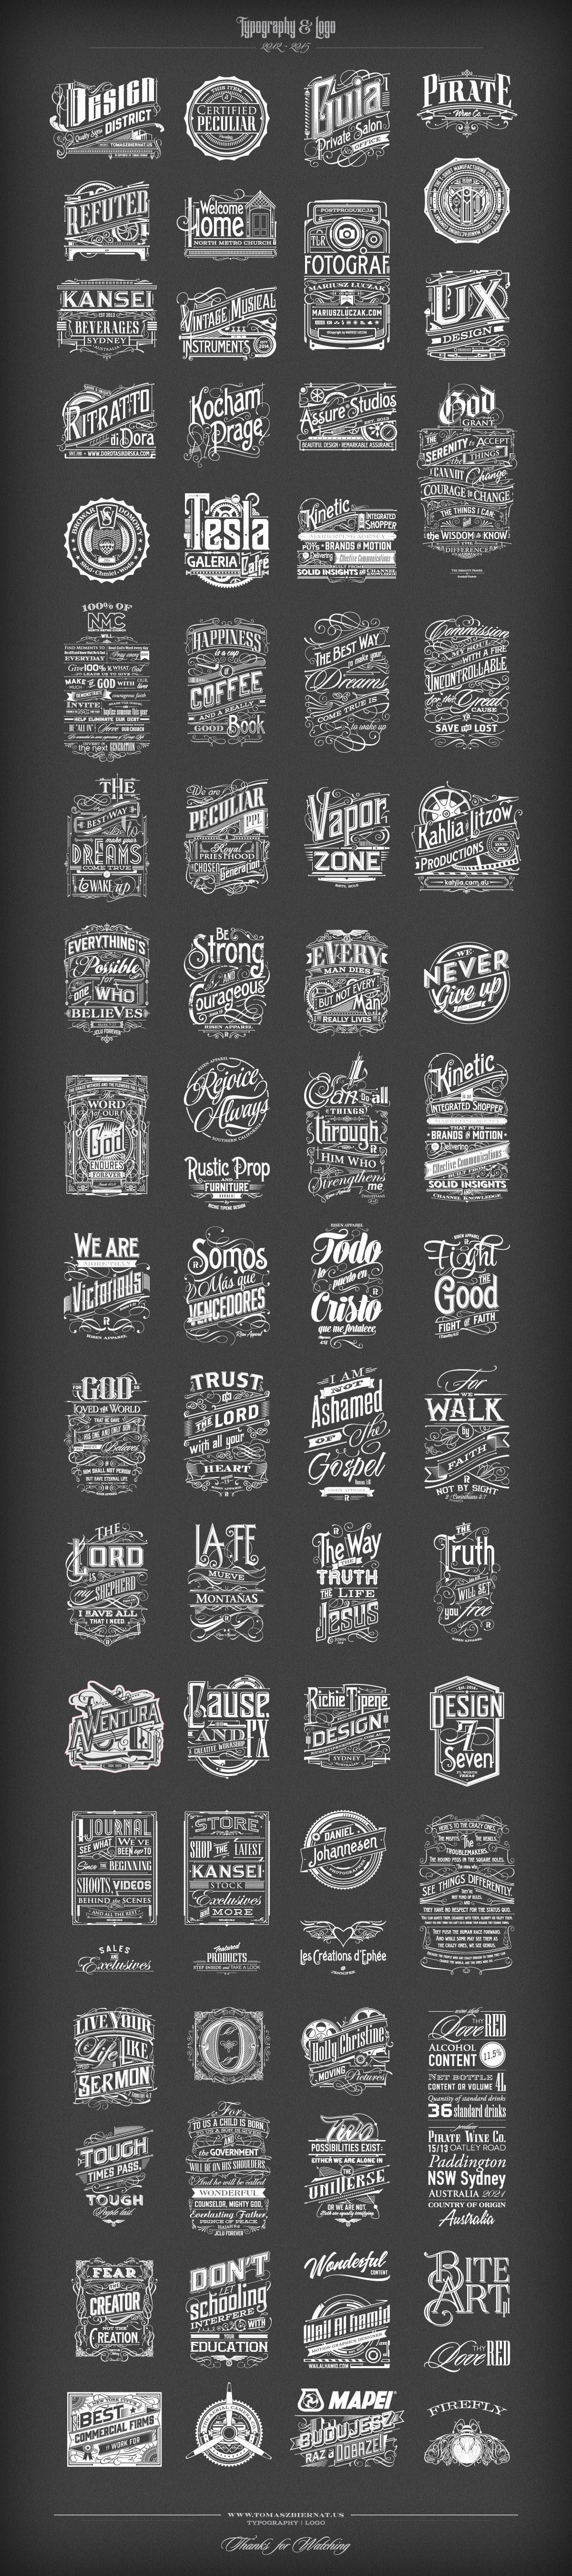 typografia type apparel logo logos custom apparel inspiration design tomasz biernat poster tshirt inspirational quotes verses home decor